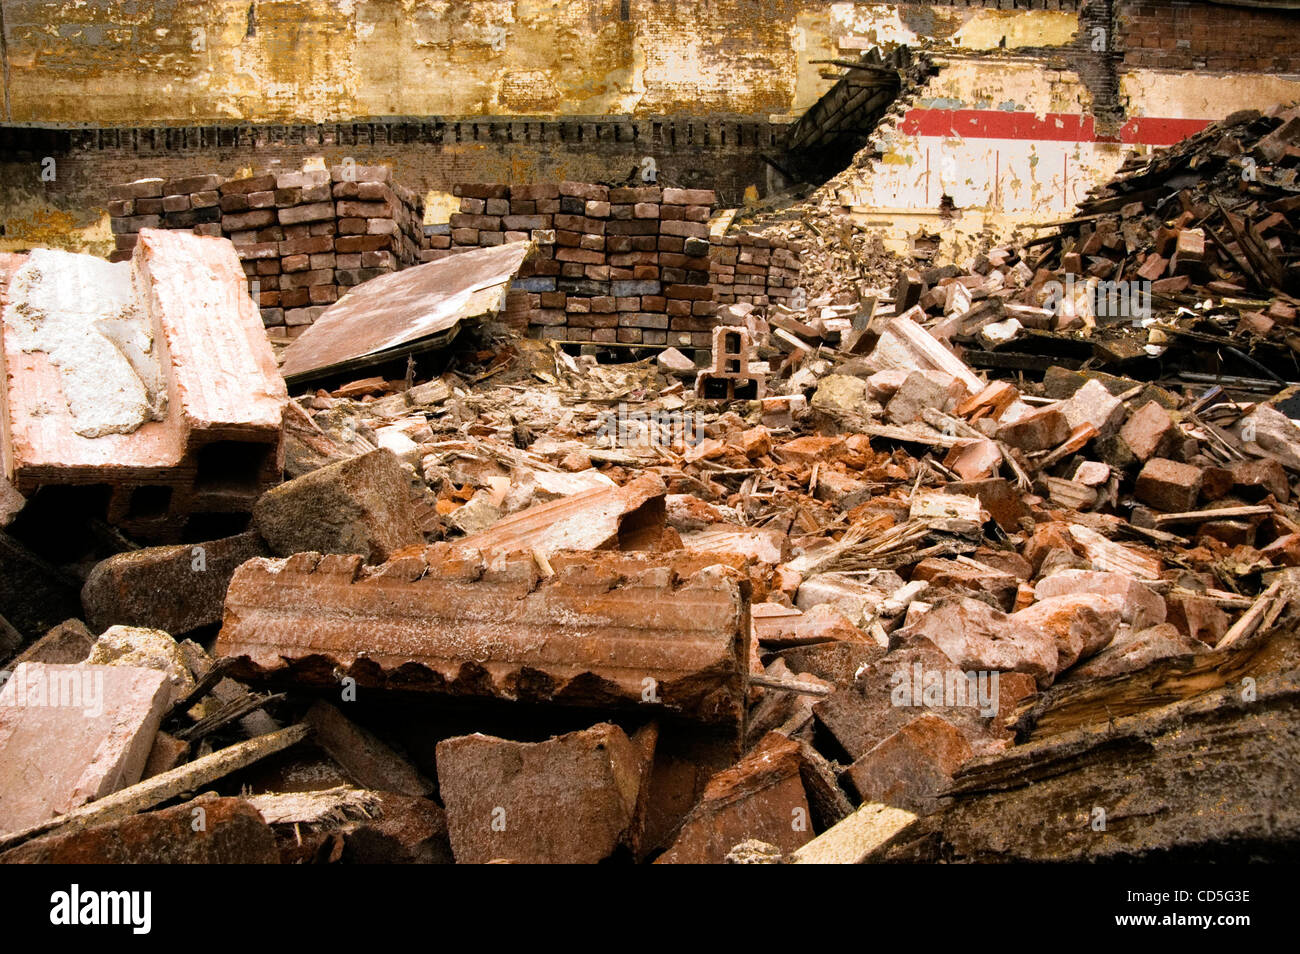 Scrap Materials Stock Photos & Scrap Materials Stock Images - Alamy